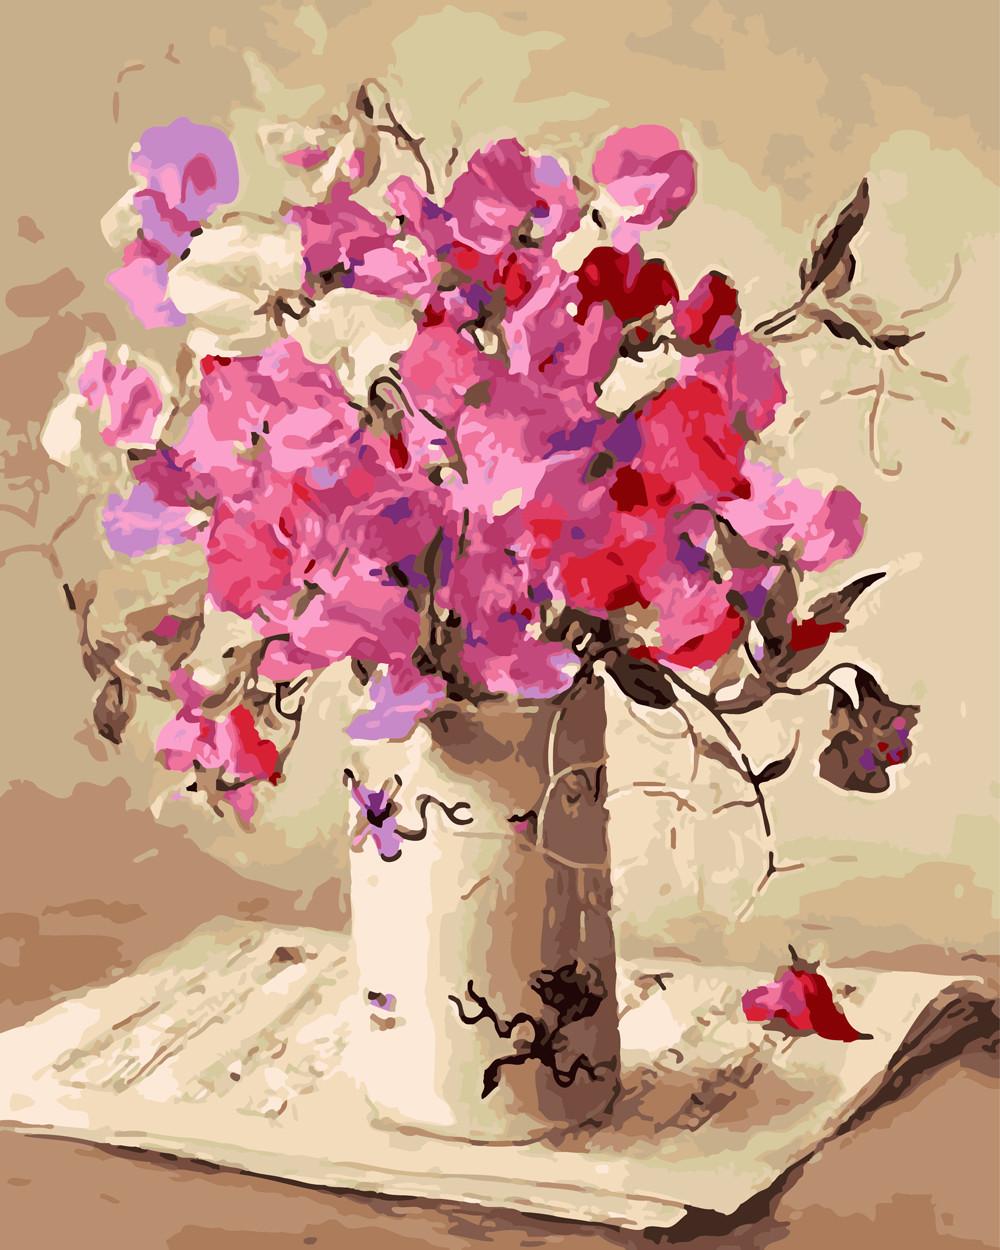 Картина по номерам Музыка цветов 40 х 50 см (BRM26111)